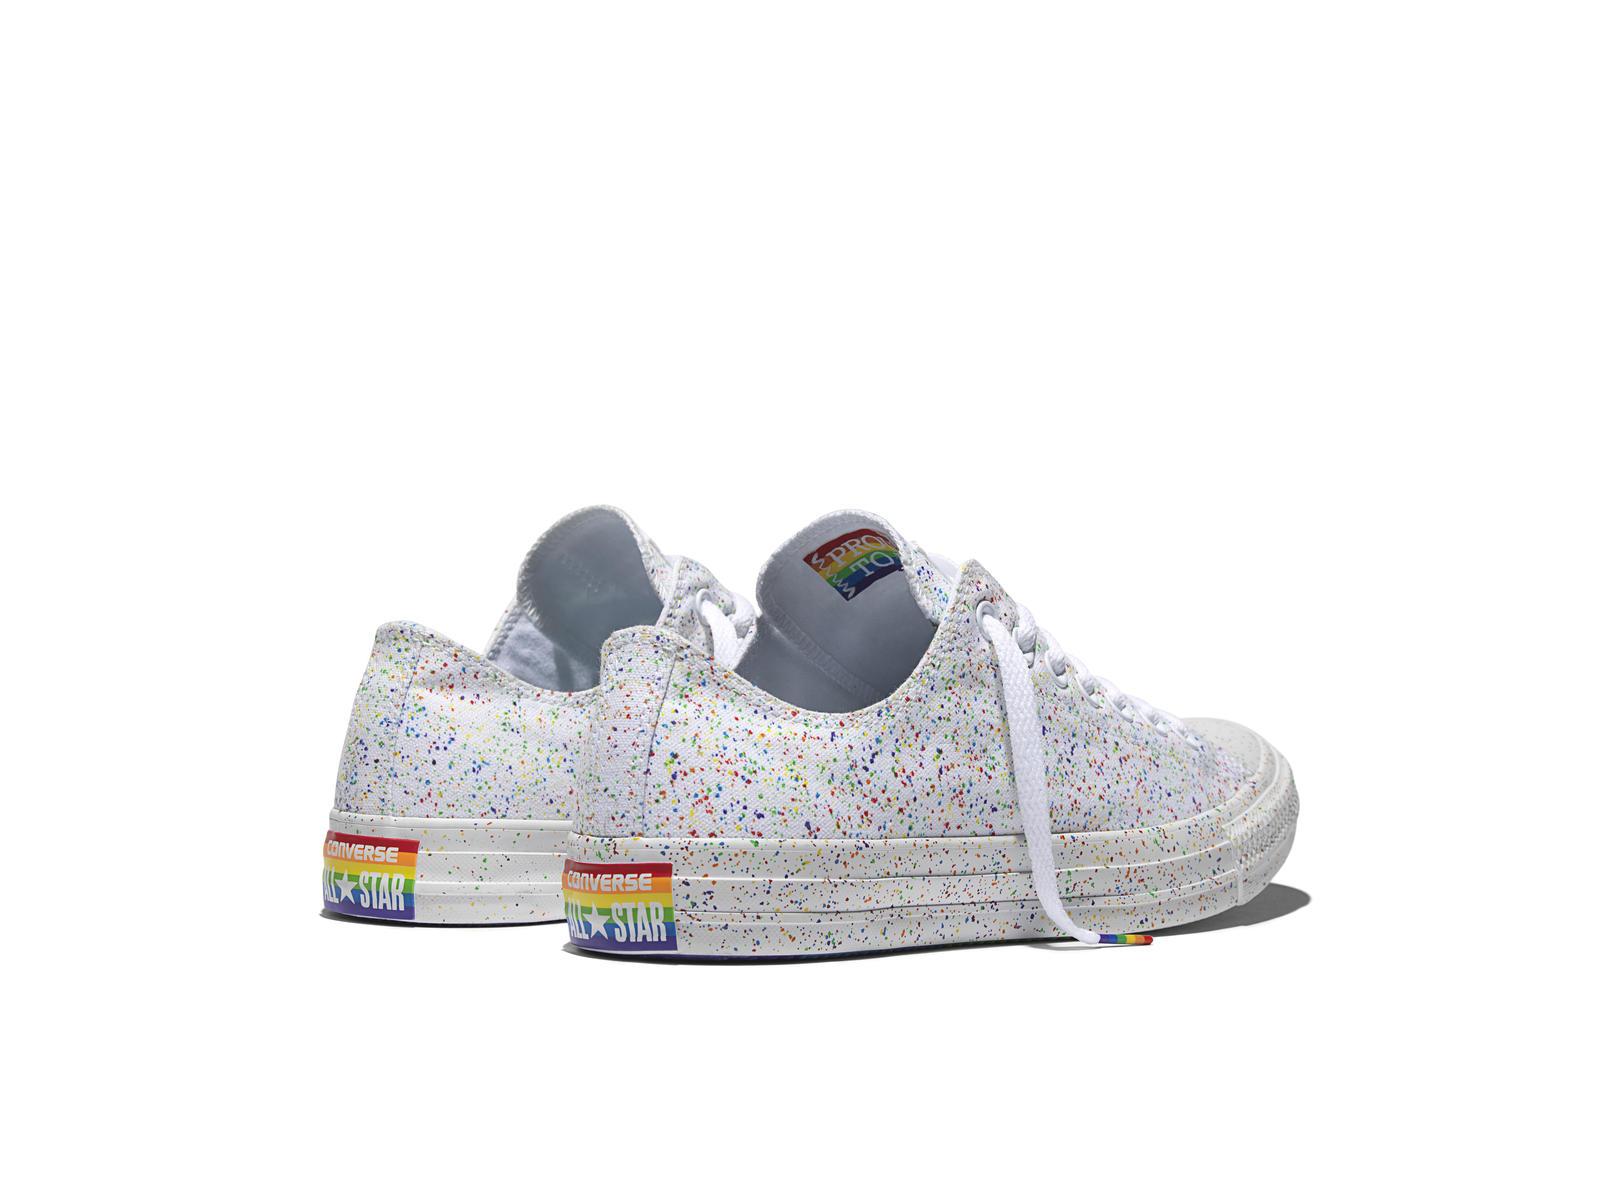 Chuck Taylor Converse Tennis Shoes